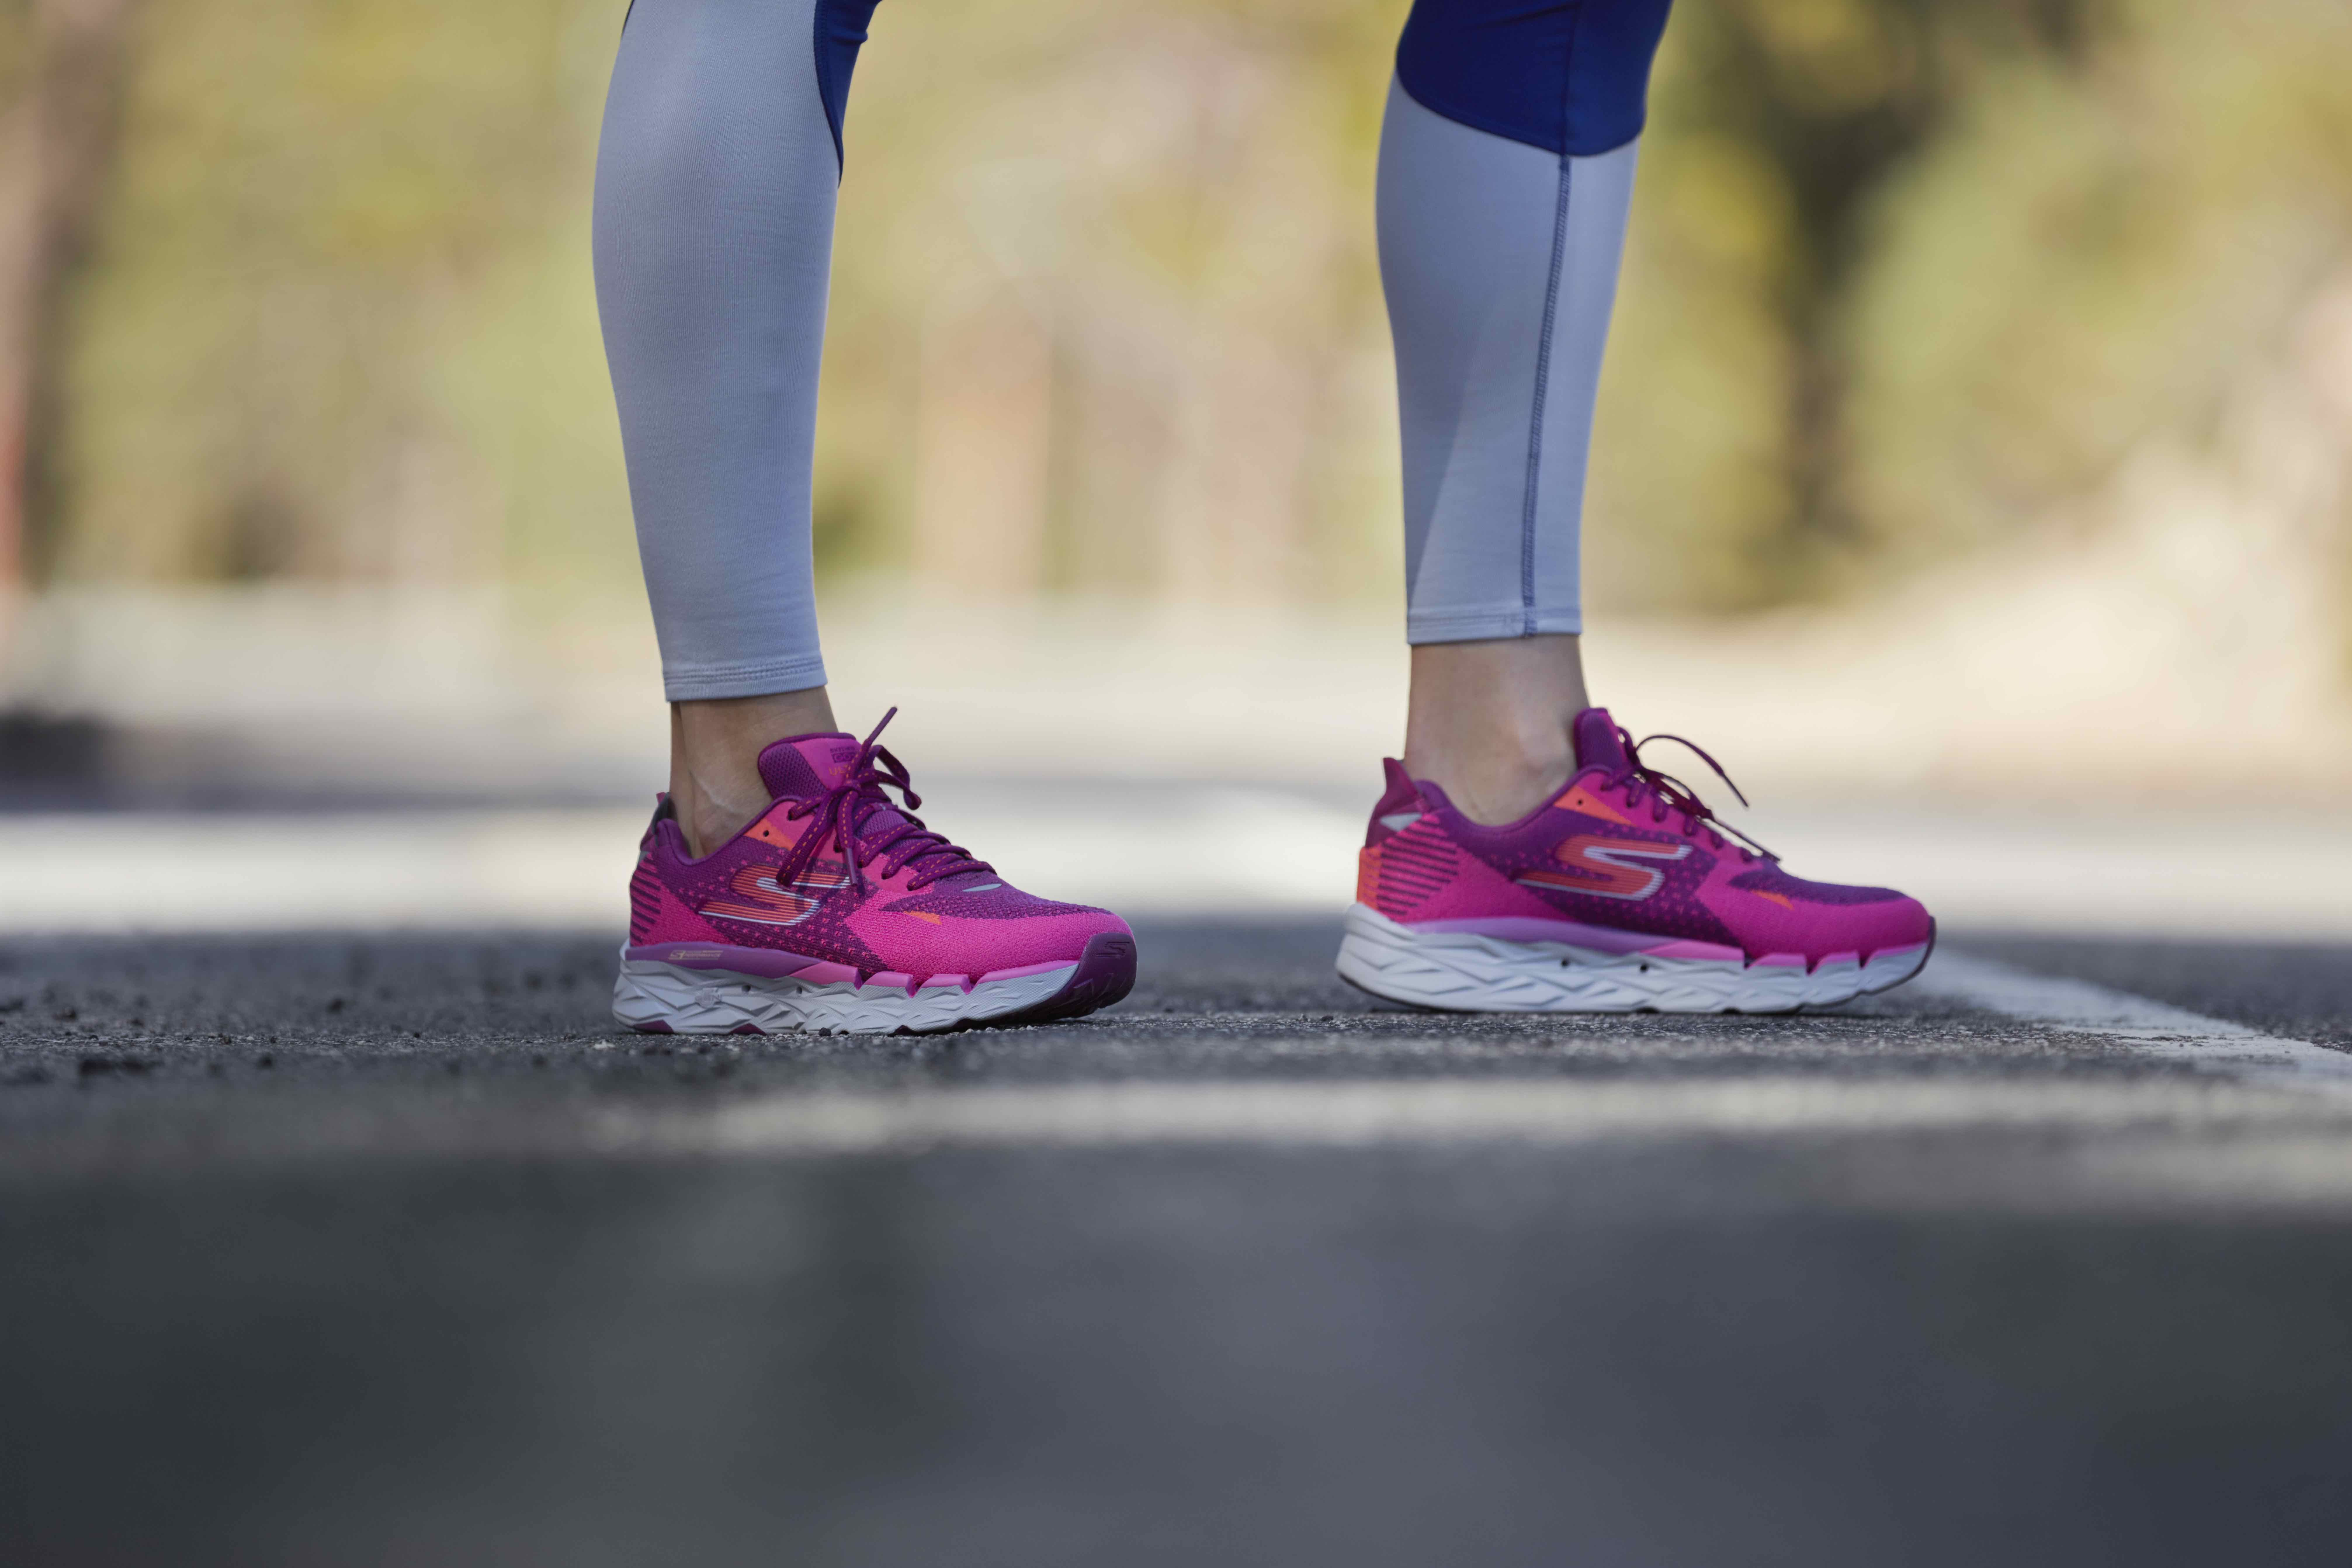 Aplicable con las manos en la masa munición  The Skechers GOrun Ultra R 2™ max cushioned trainer. Winter running. |  Womens running shoes, Running, Running women